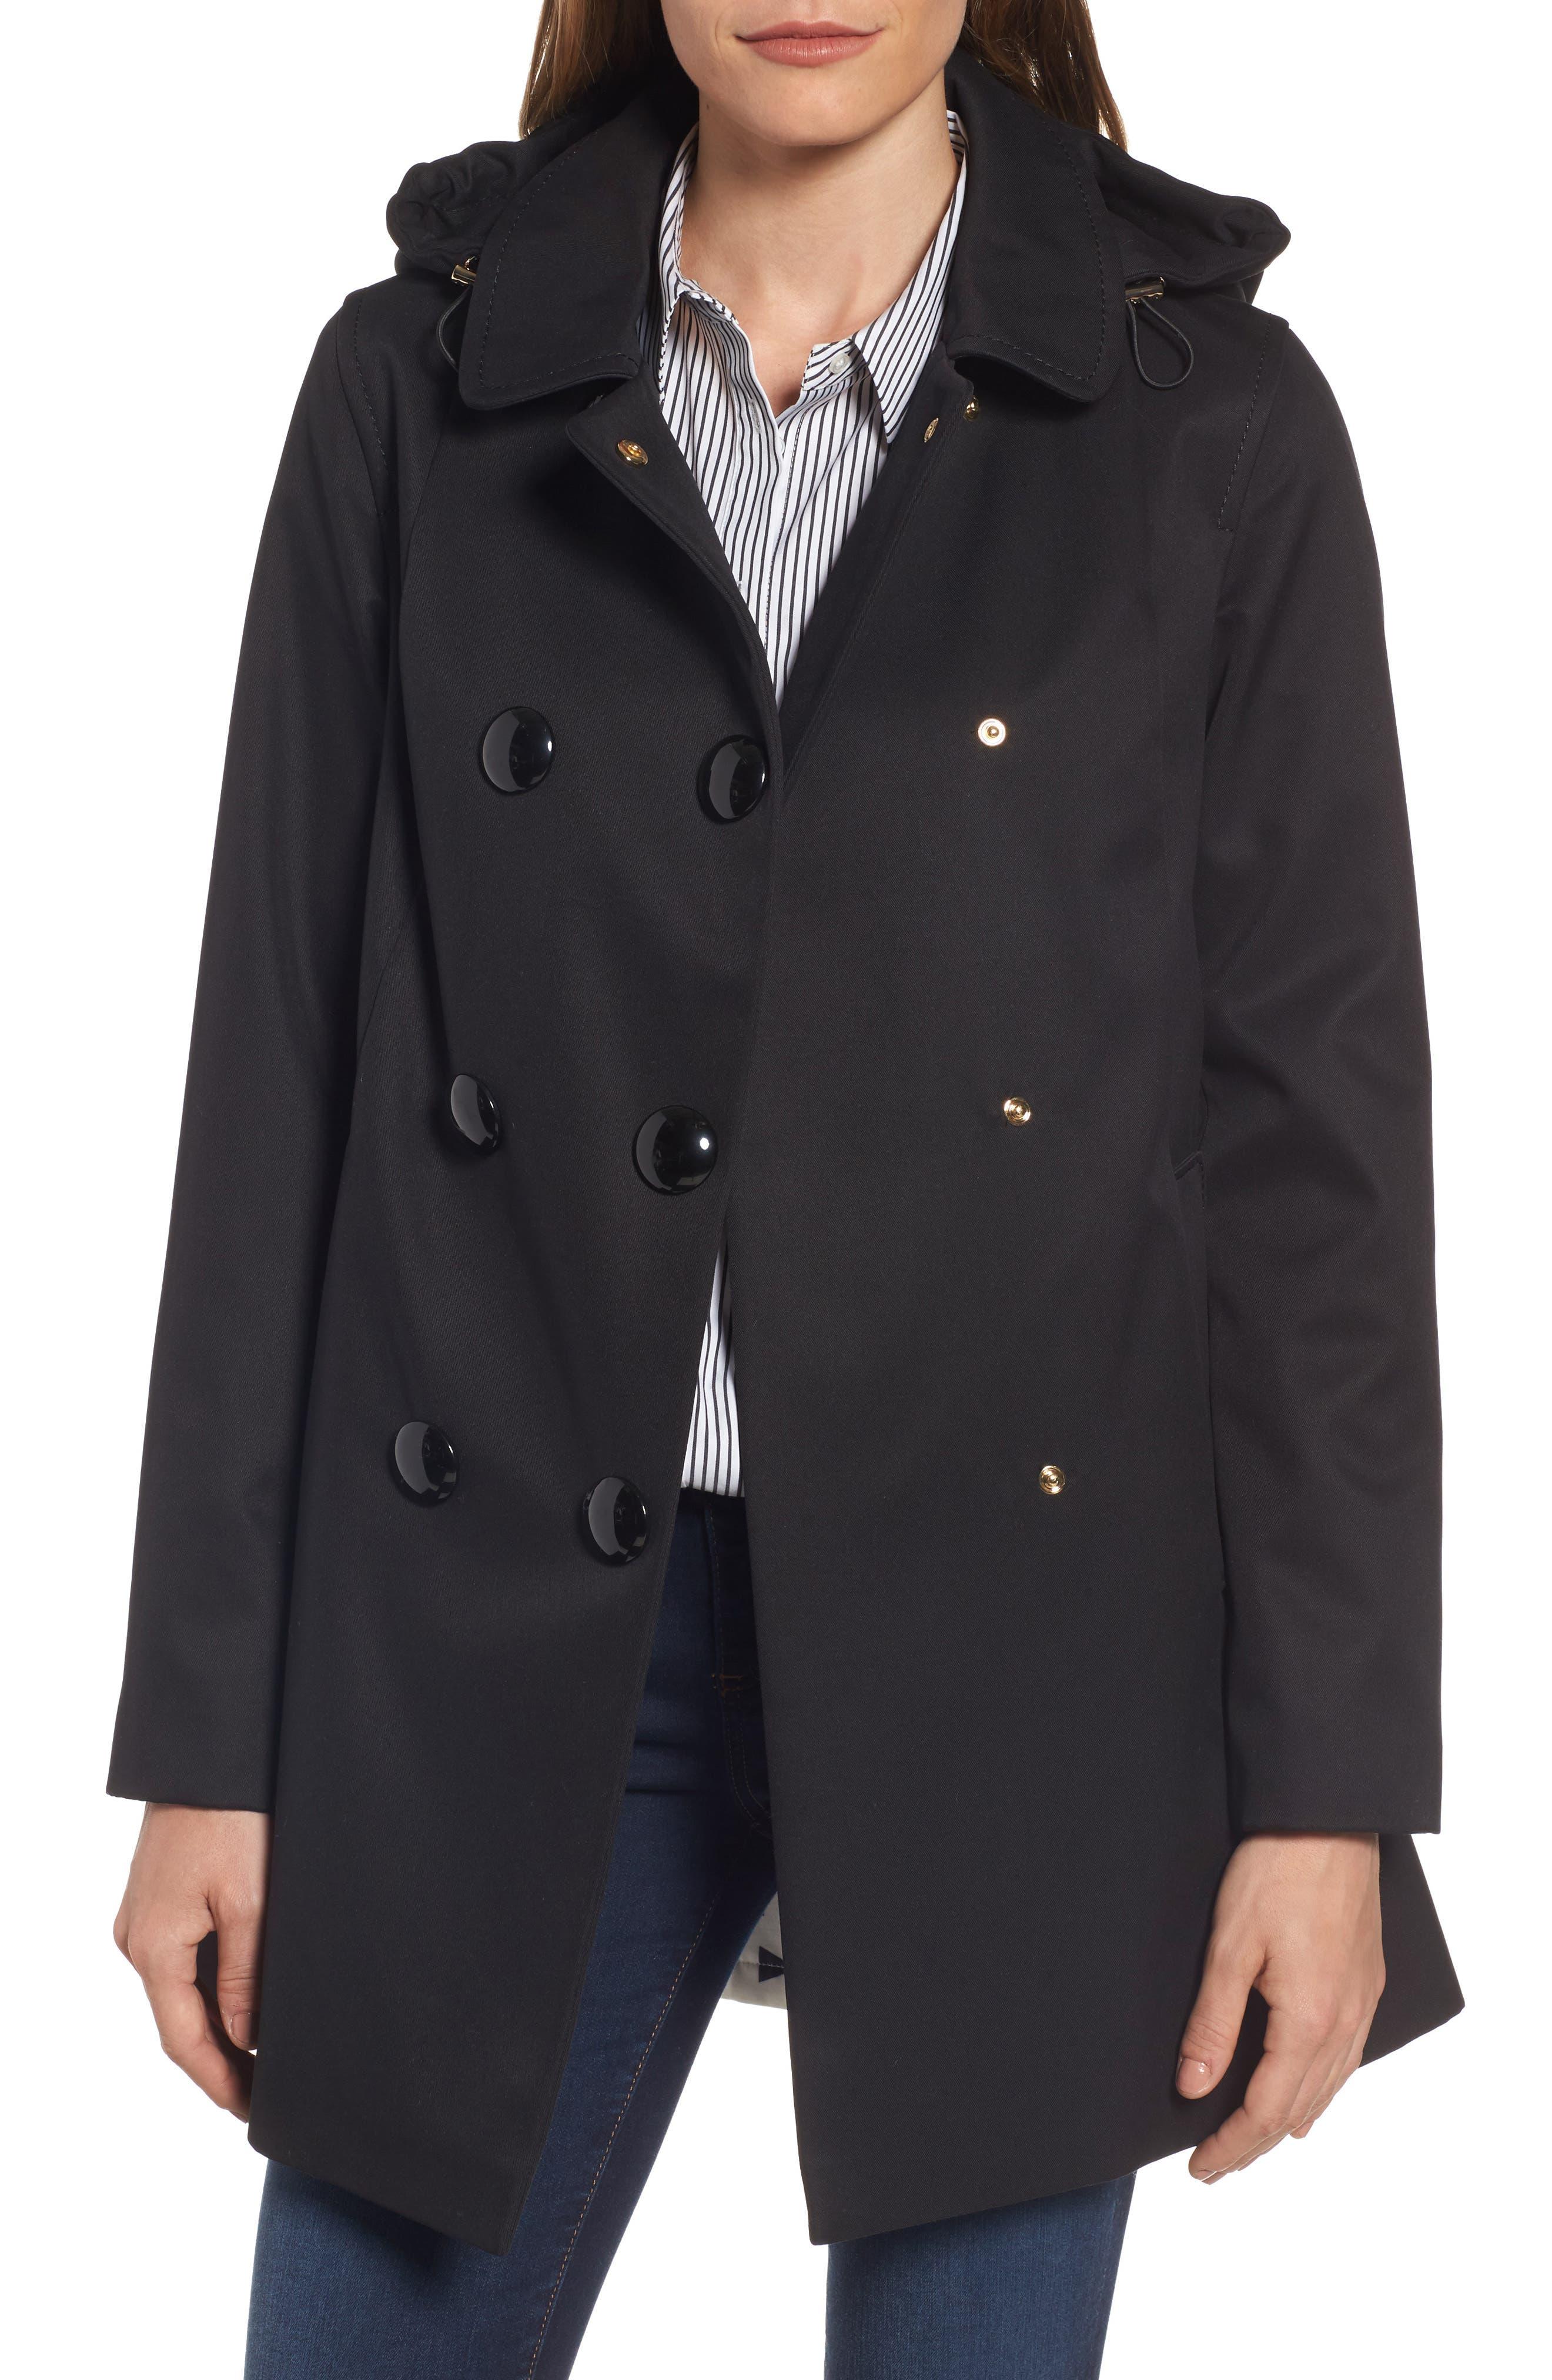 Alternate Image 1 Selected - kate spade new york scallop pocket a-line raincoat (regular & petite)